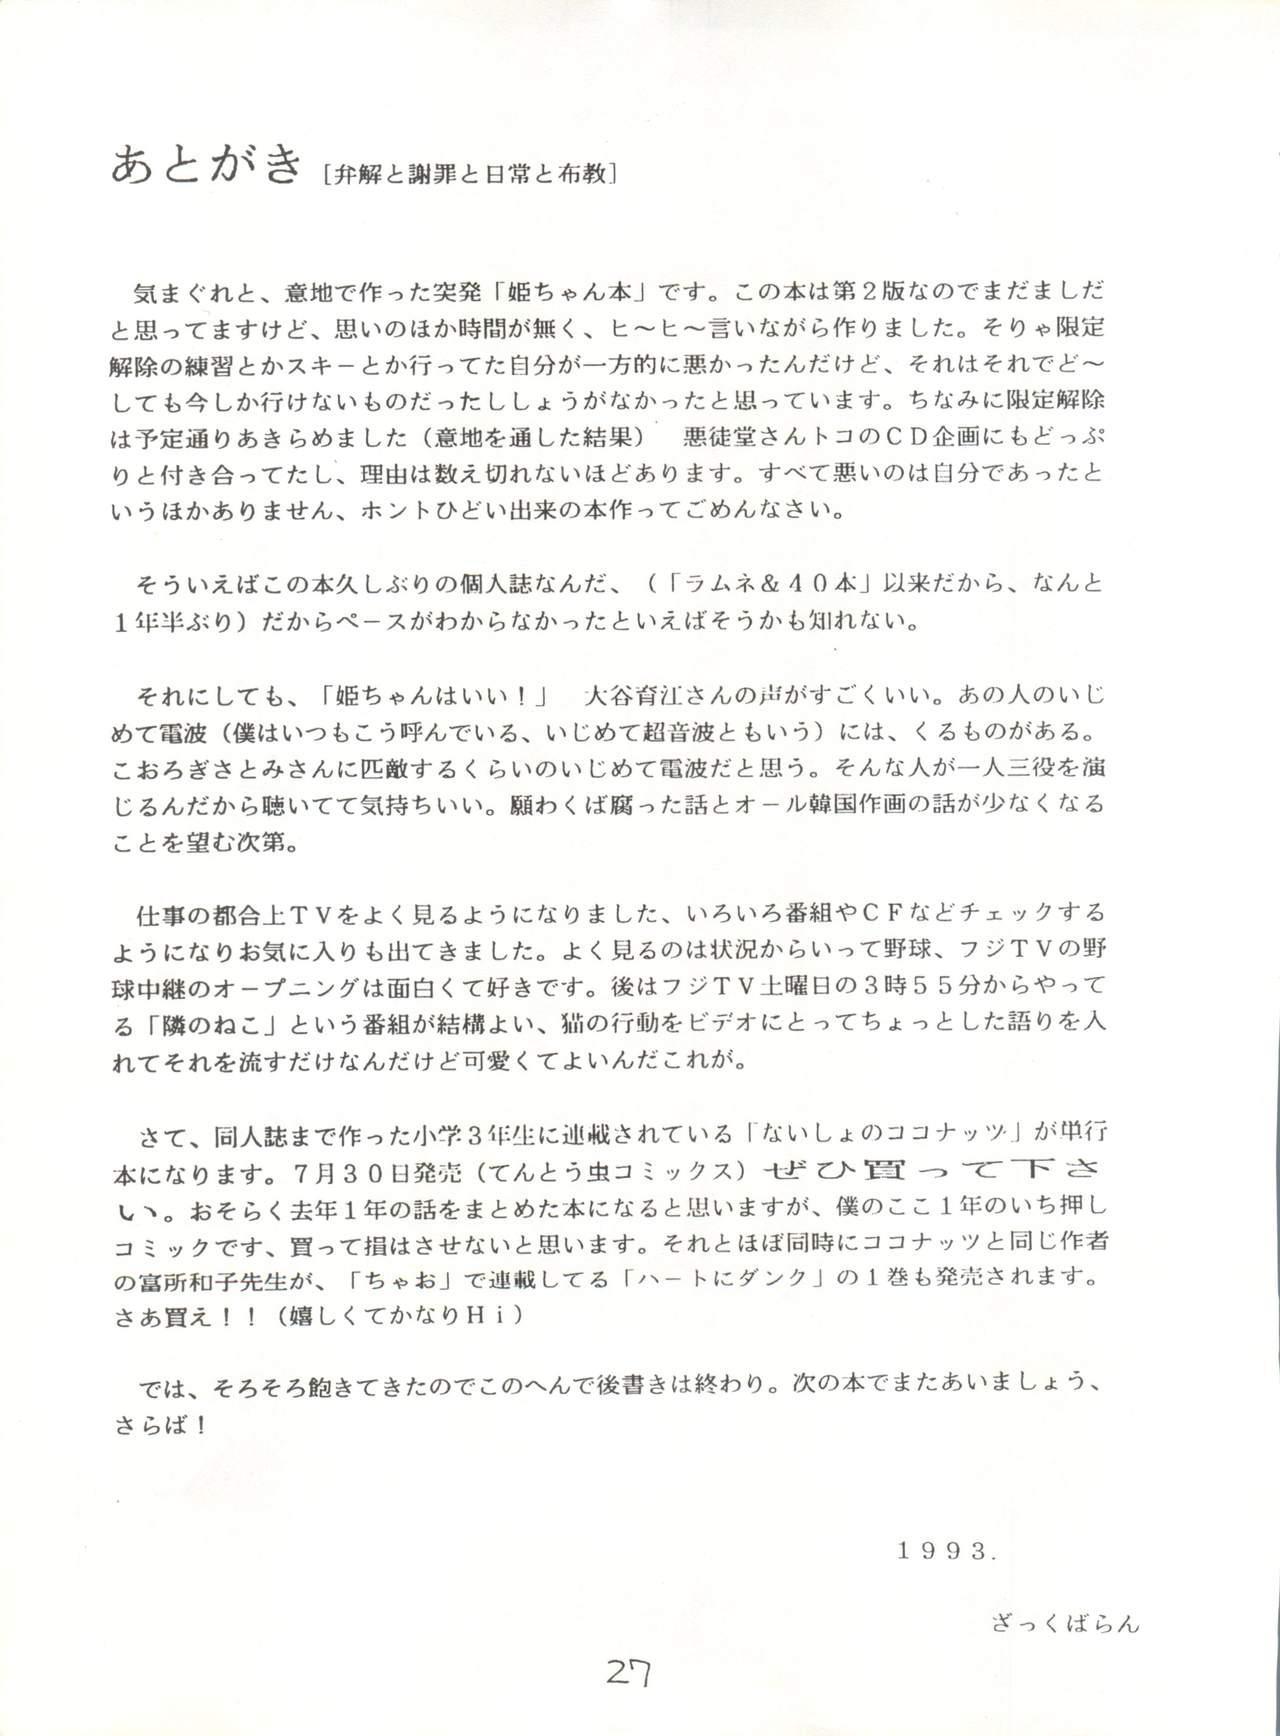 [Global One (MARO)] Sadistic 5 (Cutey Honey, Devilman, Sailor Moon), [Global One (MARO)] Sadistic (Dirty Pair, Fushigi no Umi no Nadia, Sailor Moon), [Studio Ikkatsumajin] .ribbon (Hime-chan's Ribbon) 150